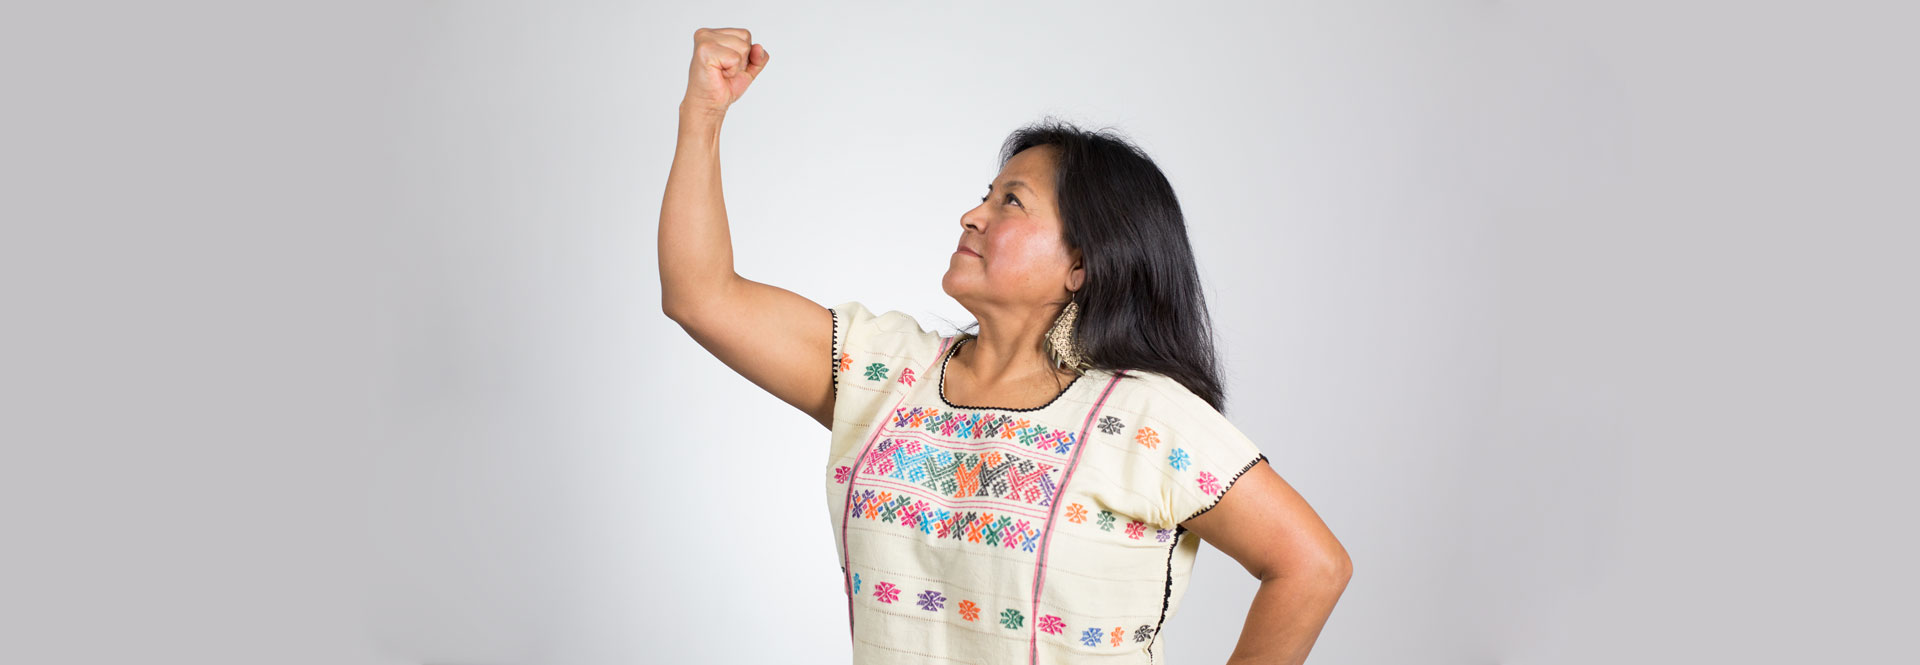 Carmen Guerrero, co-founder of CoaliciónFortaleza Latina, pro-immigrant organization based in Norristown.